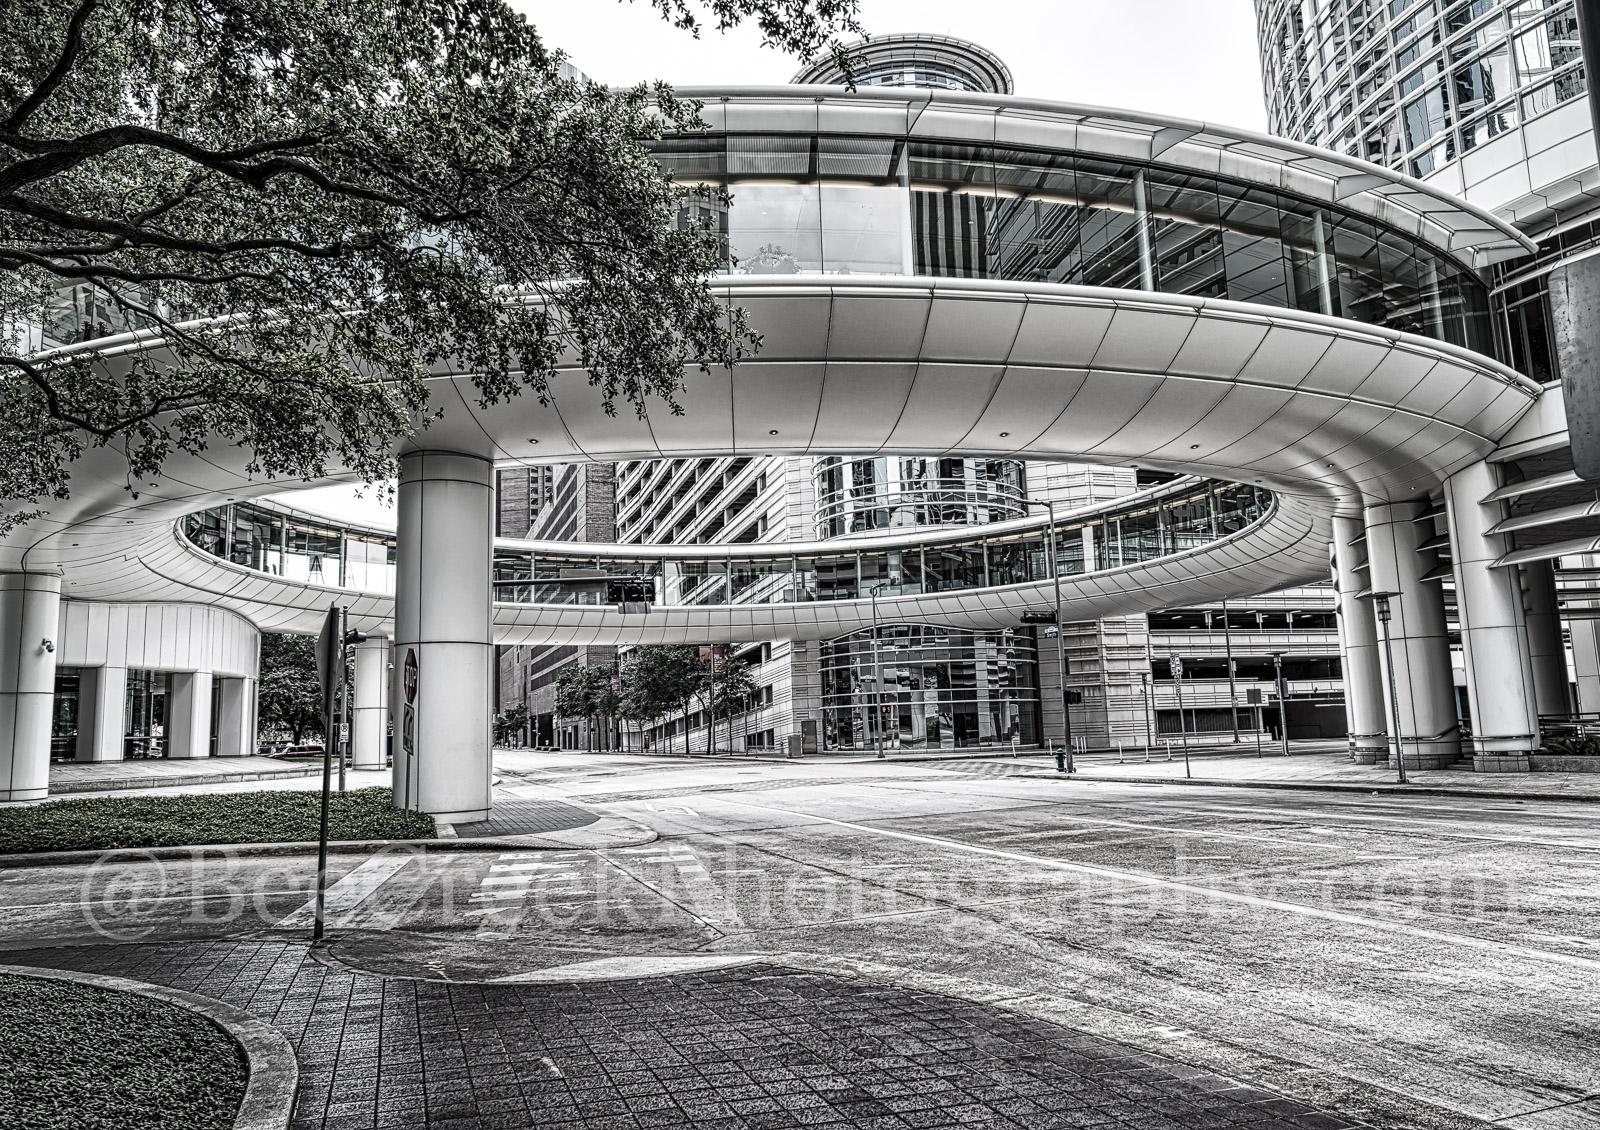 Houston, Chevron Complex, building, skybridge, skywalk, street scene, downtown, black and white, high rise, smith street, pedestrian walkway, , photo